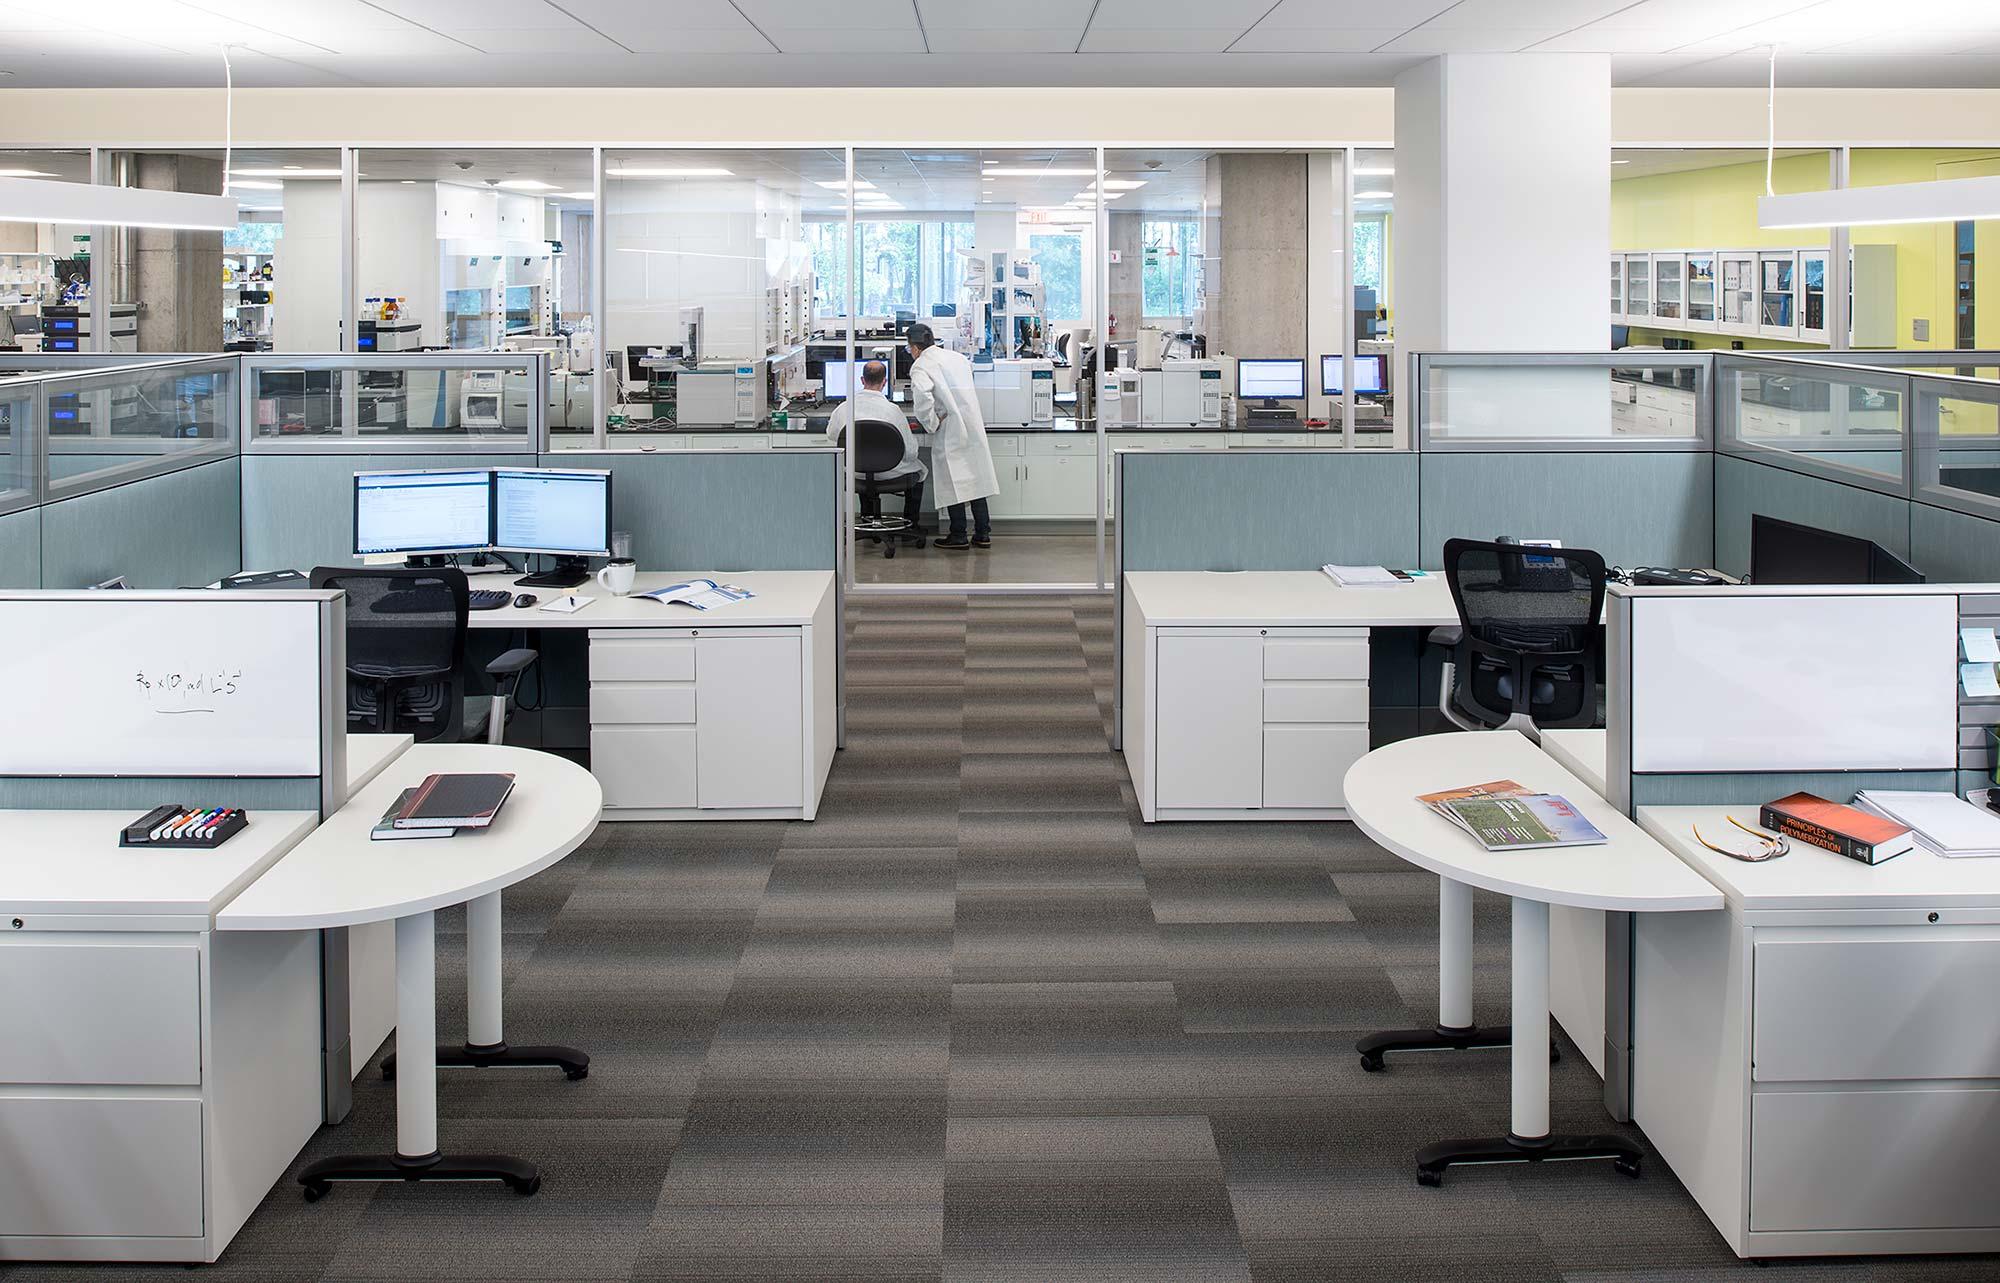 Best Kitchen Gallery: Office Design Pany  Office Design Pany Publimagen Co of Company Office Designs on rachelxblog.com